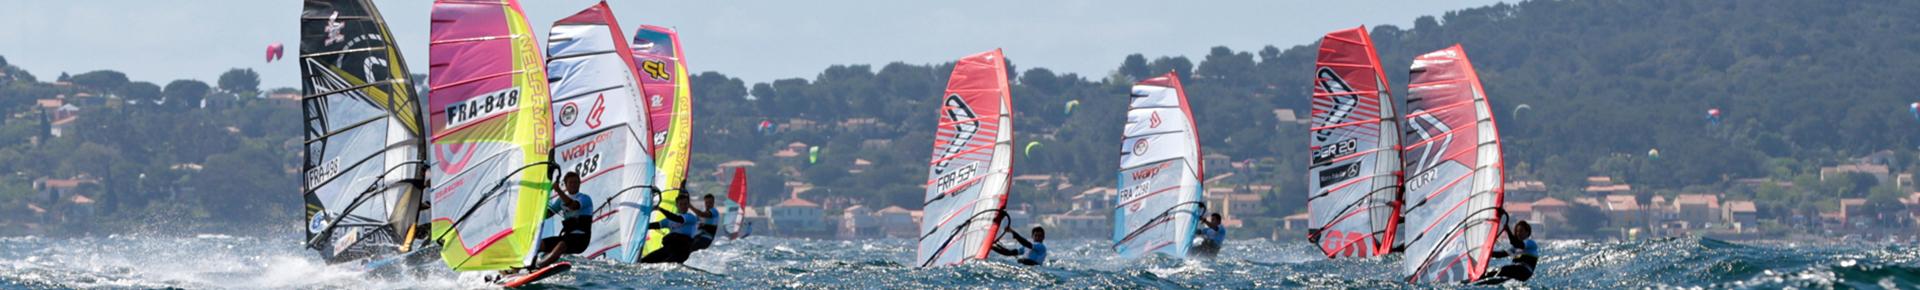 Kitesurf Et Windsurf A L Almanarre Hotel Almanarre Plage